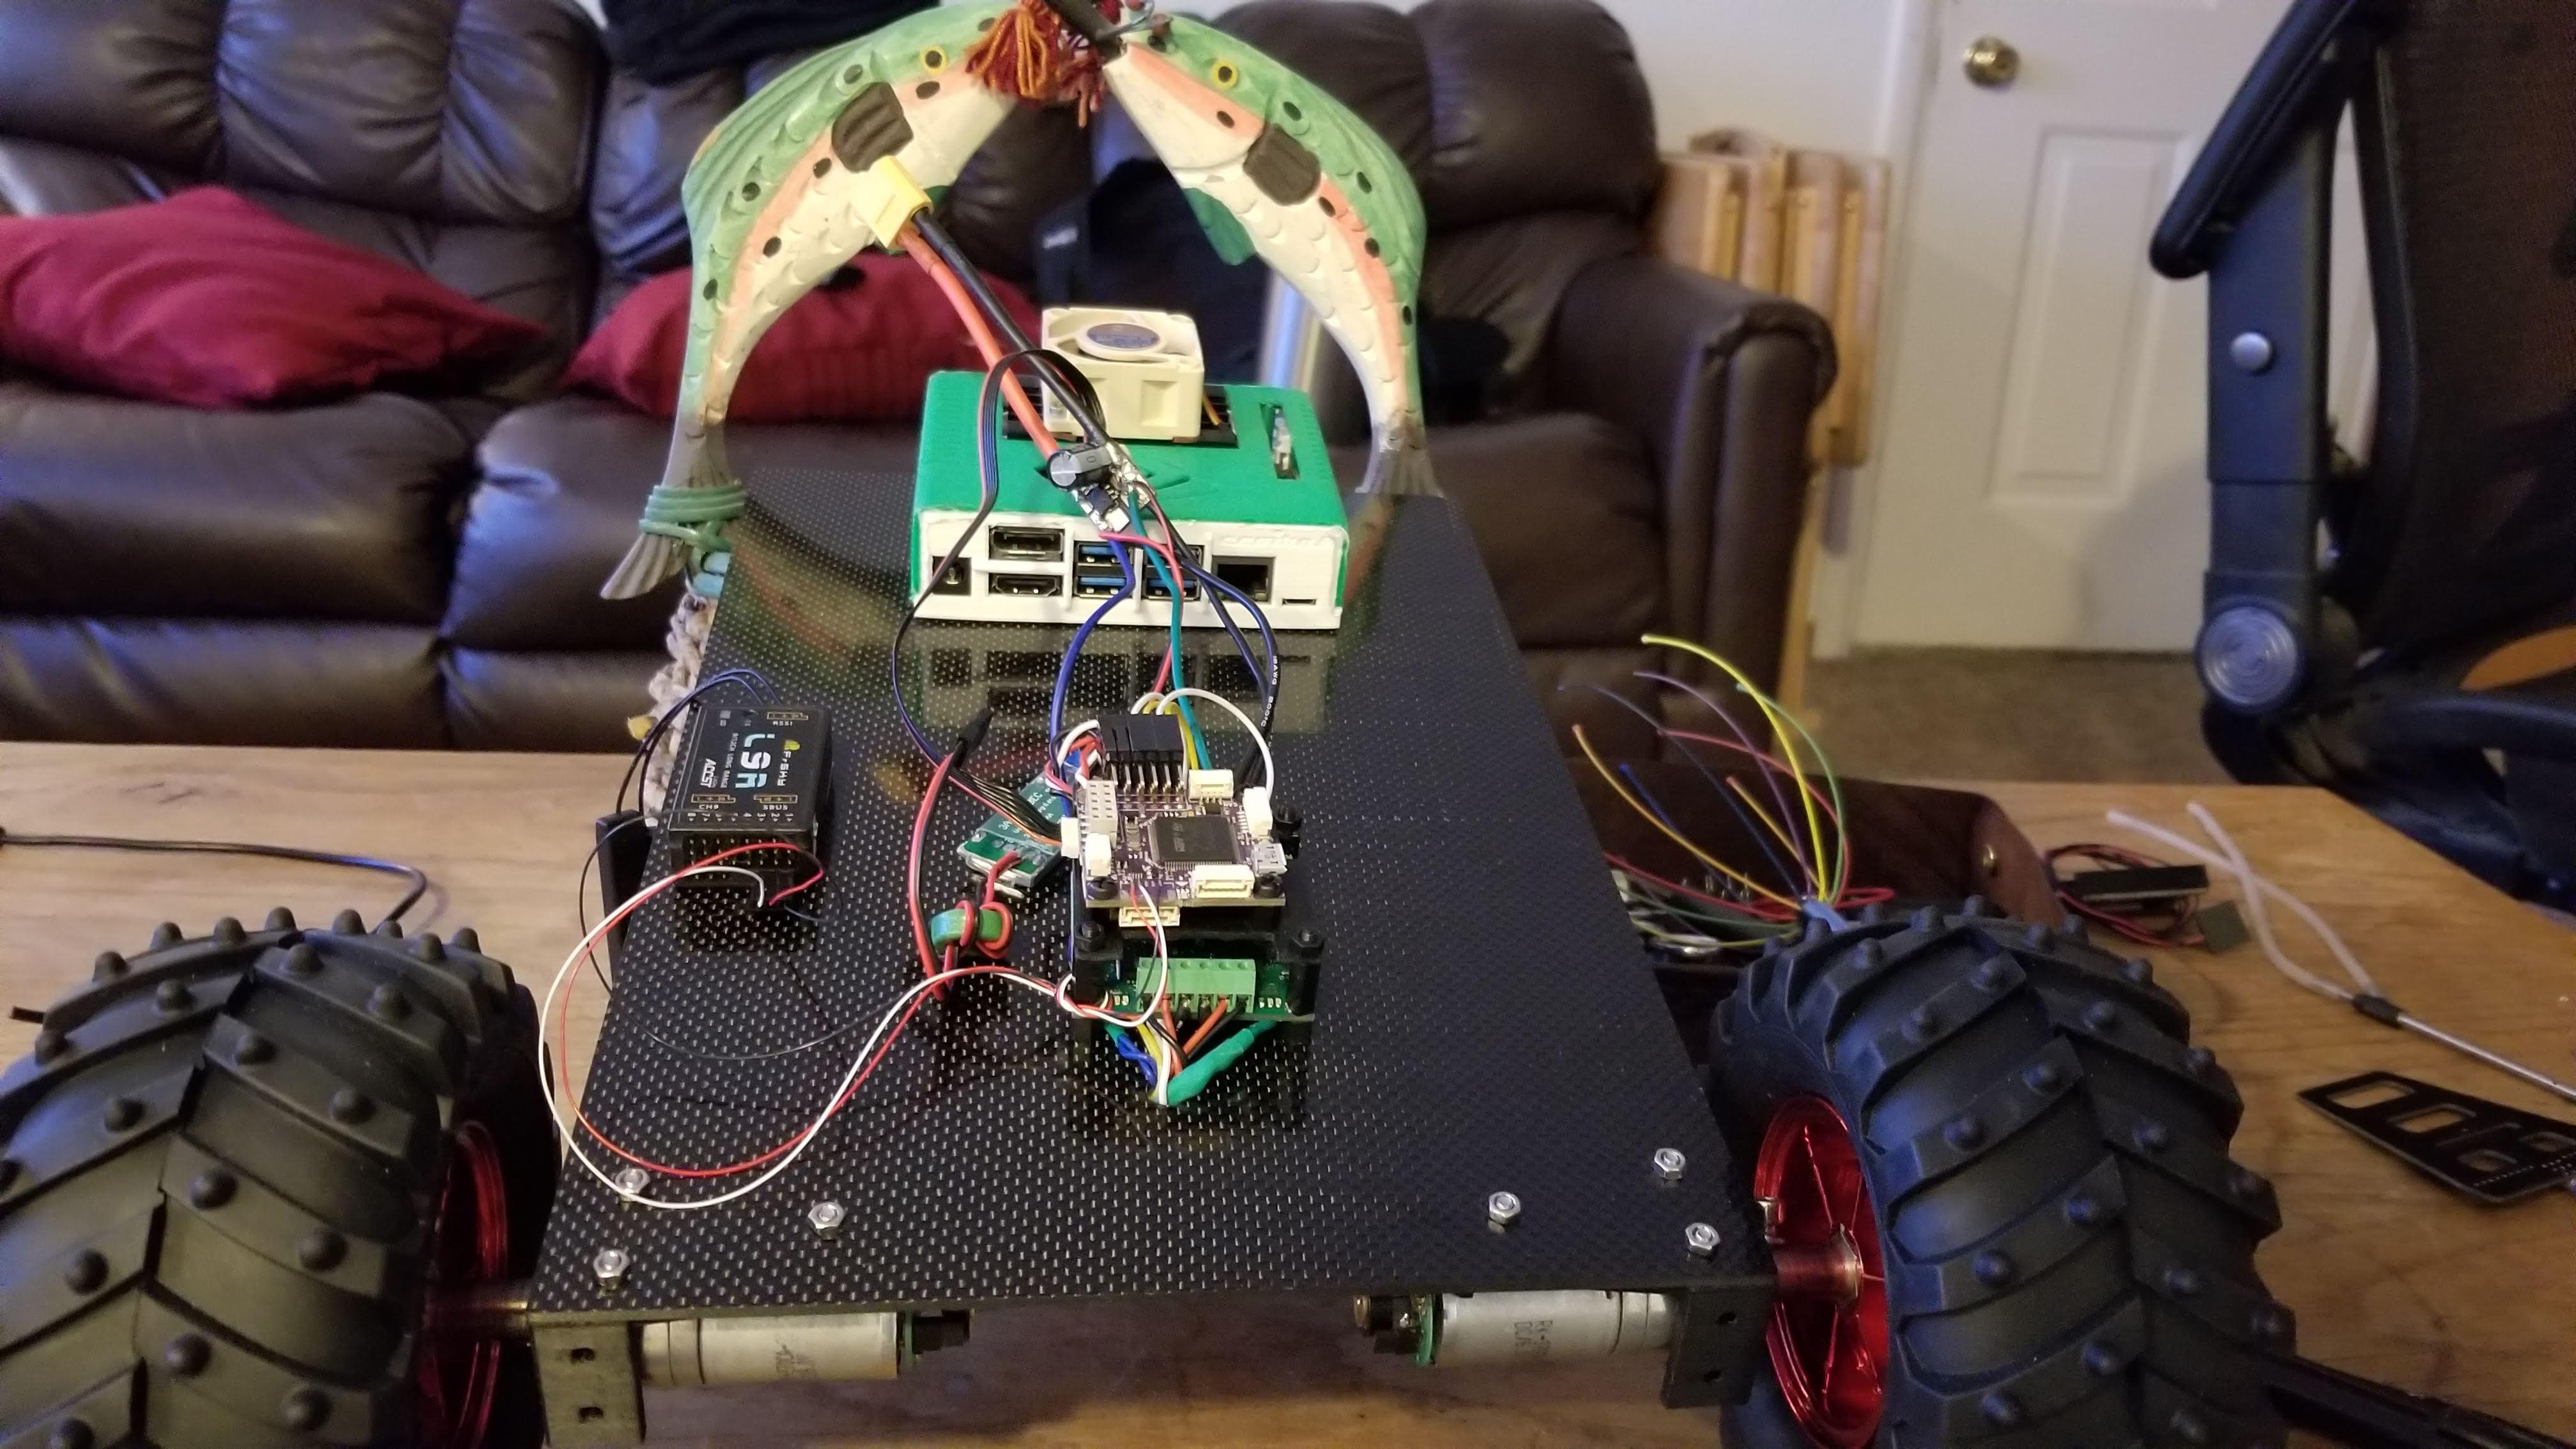 Controlador de motor de doble Pololu Trex Jr DMC02